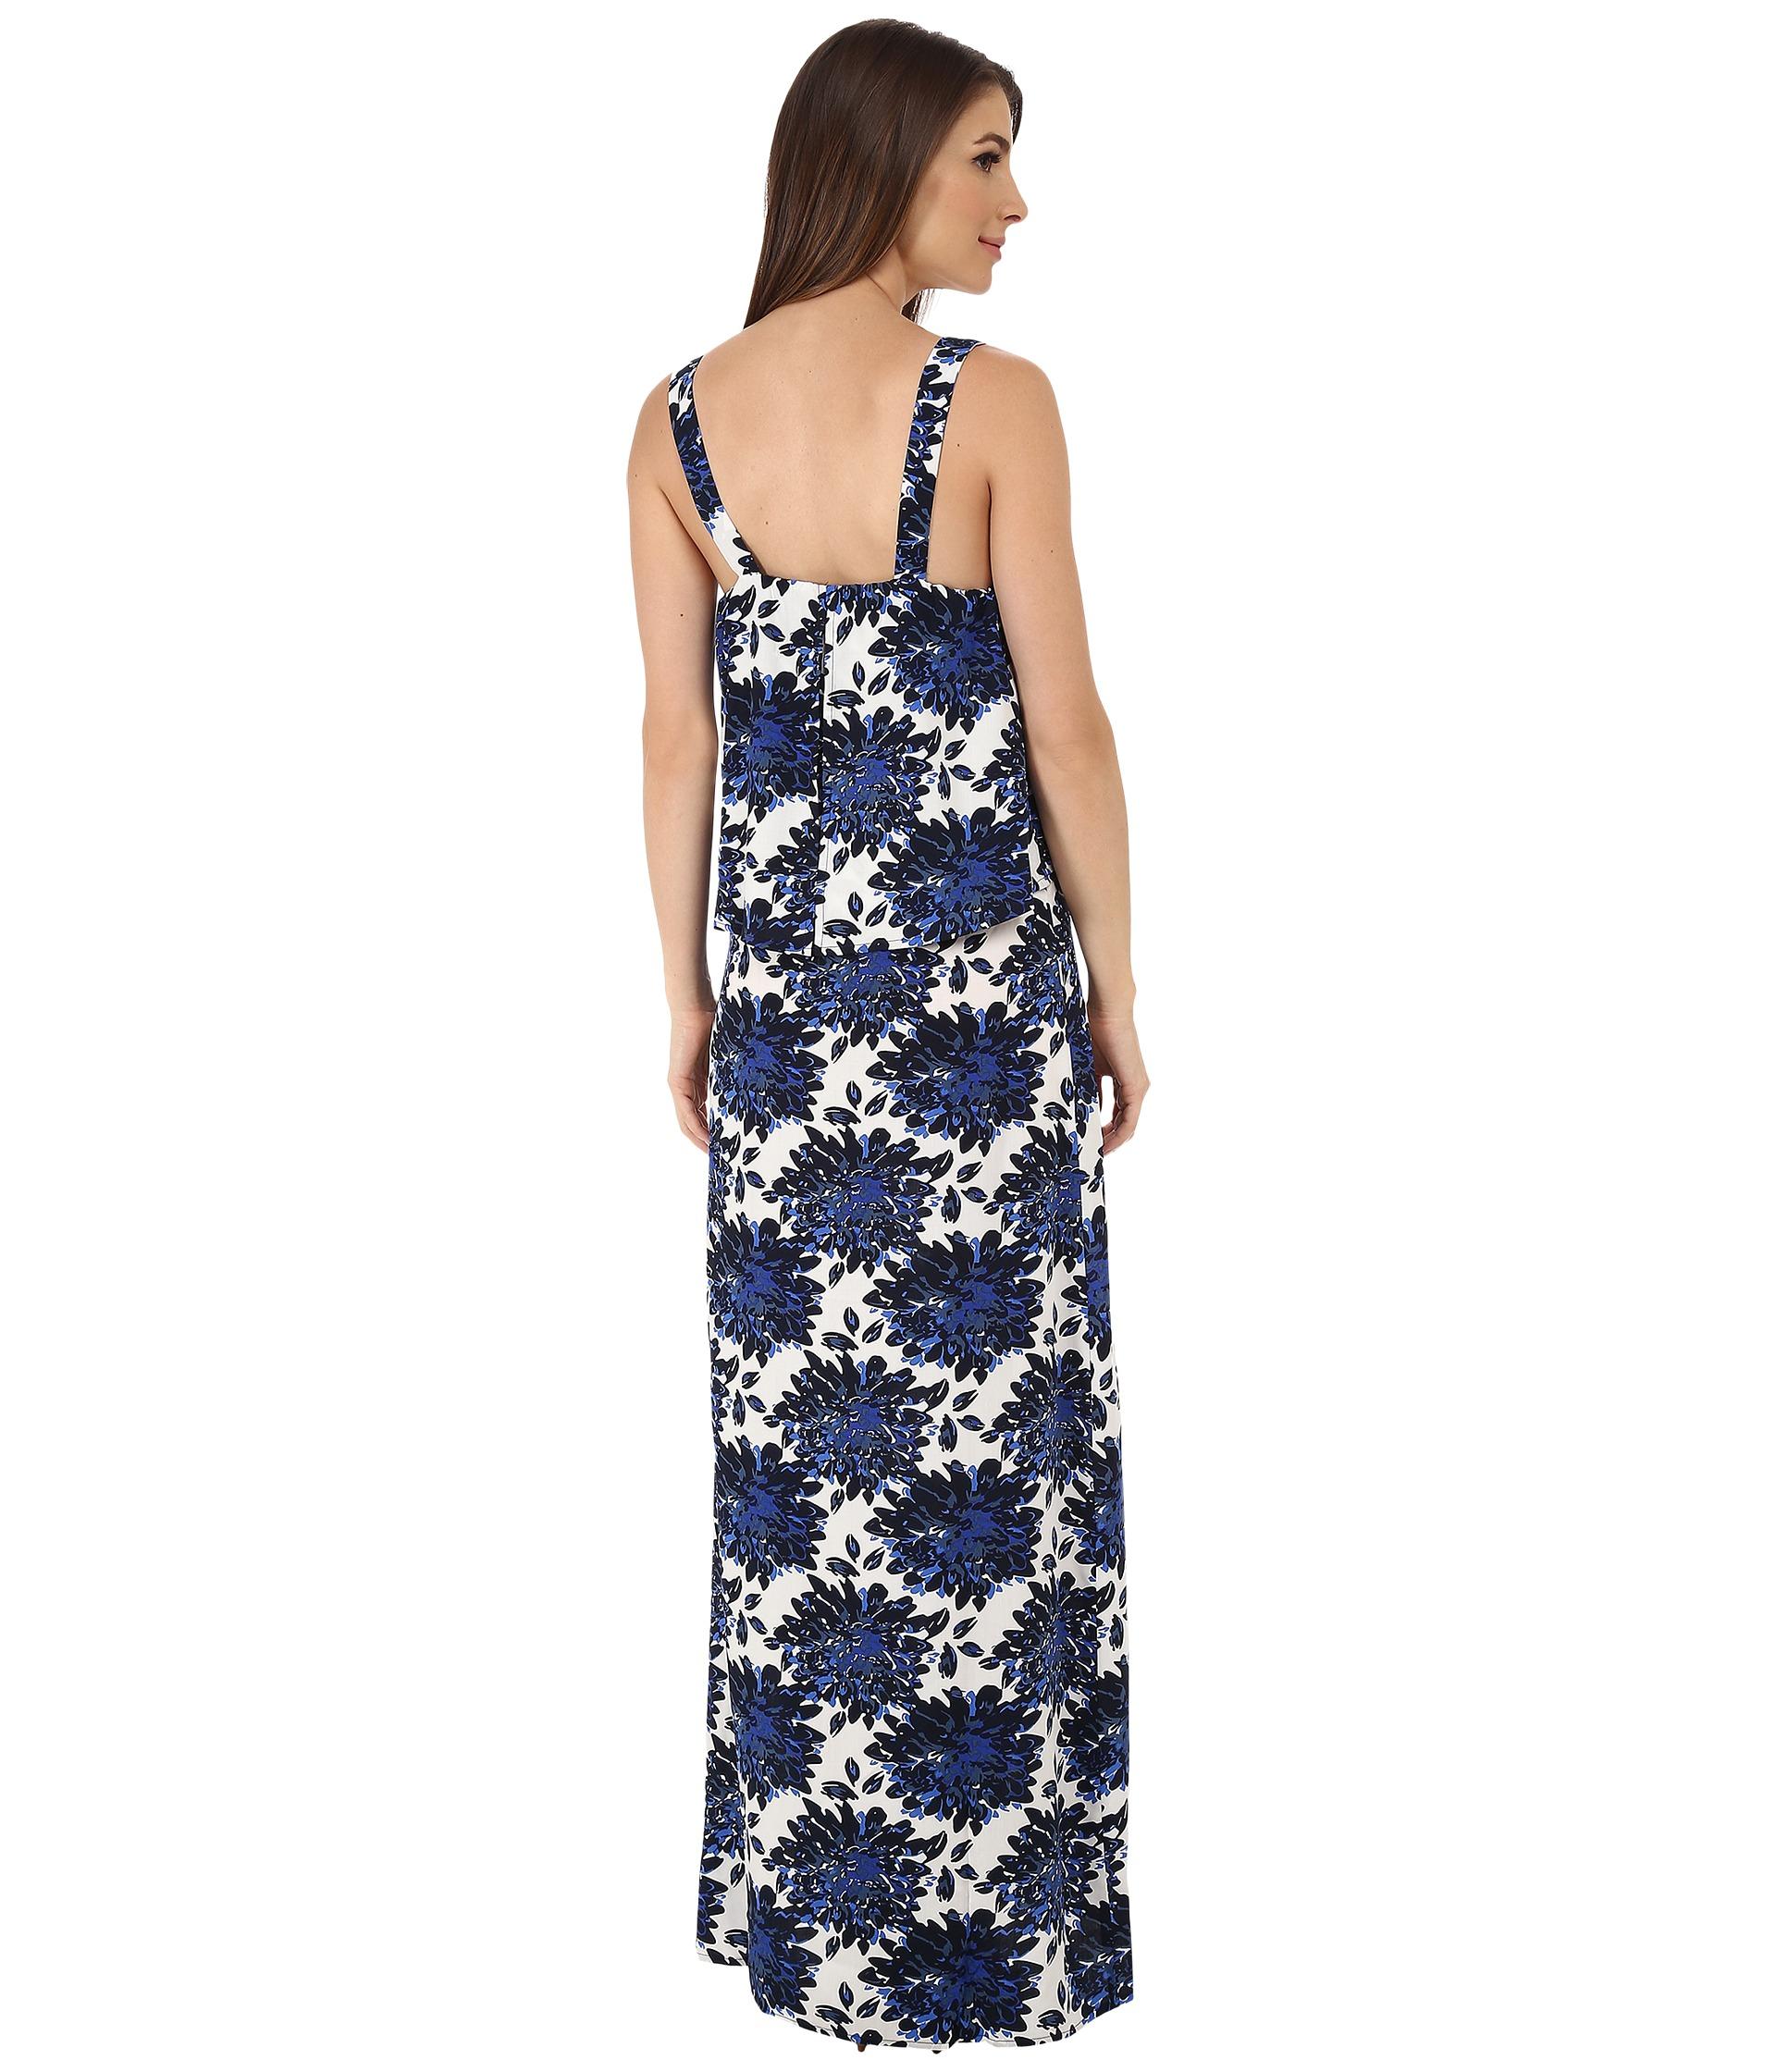 Splendid Mediterranean Blossom Maxi Dress In Blue